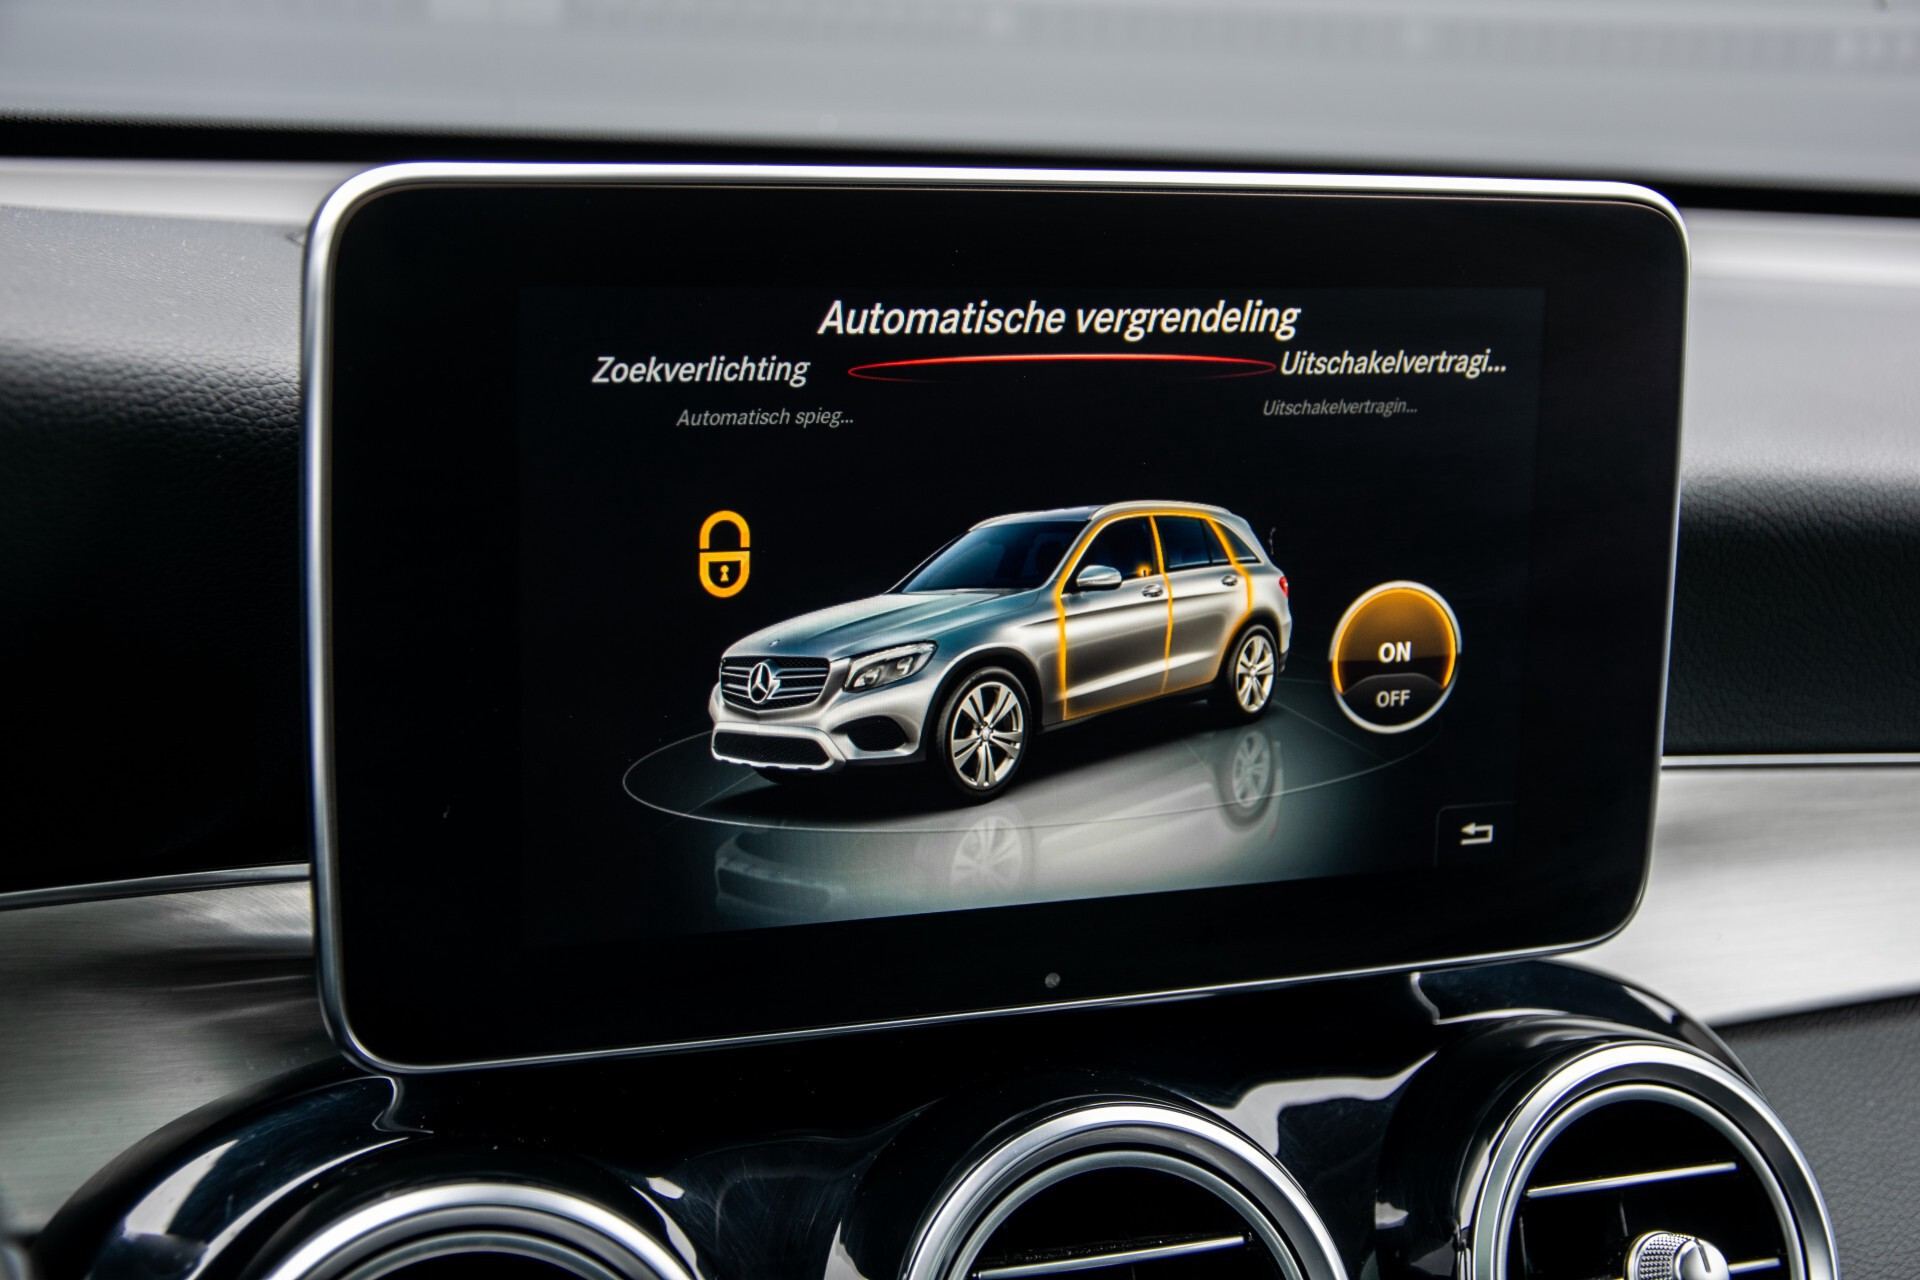 Mercedes-Benz GLC 220 d 4-M AMG/Distronic/Panorama/Comand/HUD/Afn-Trhk Aut9 Foto 18